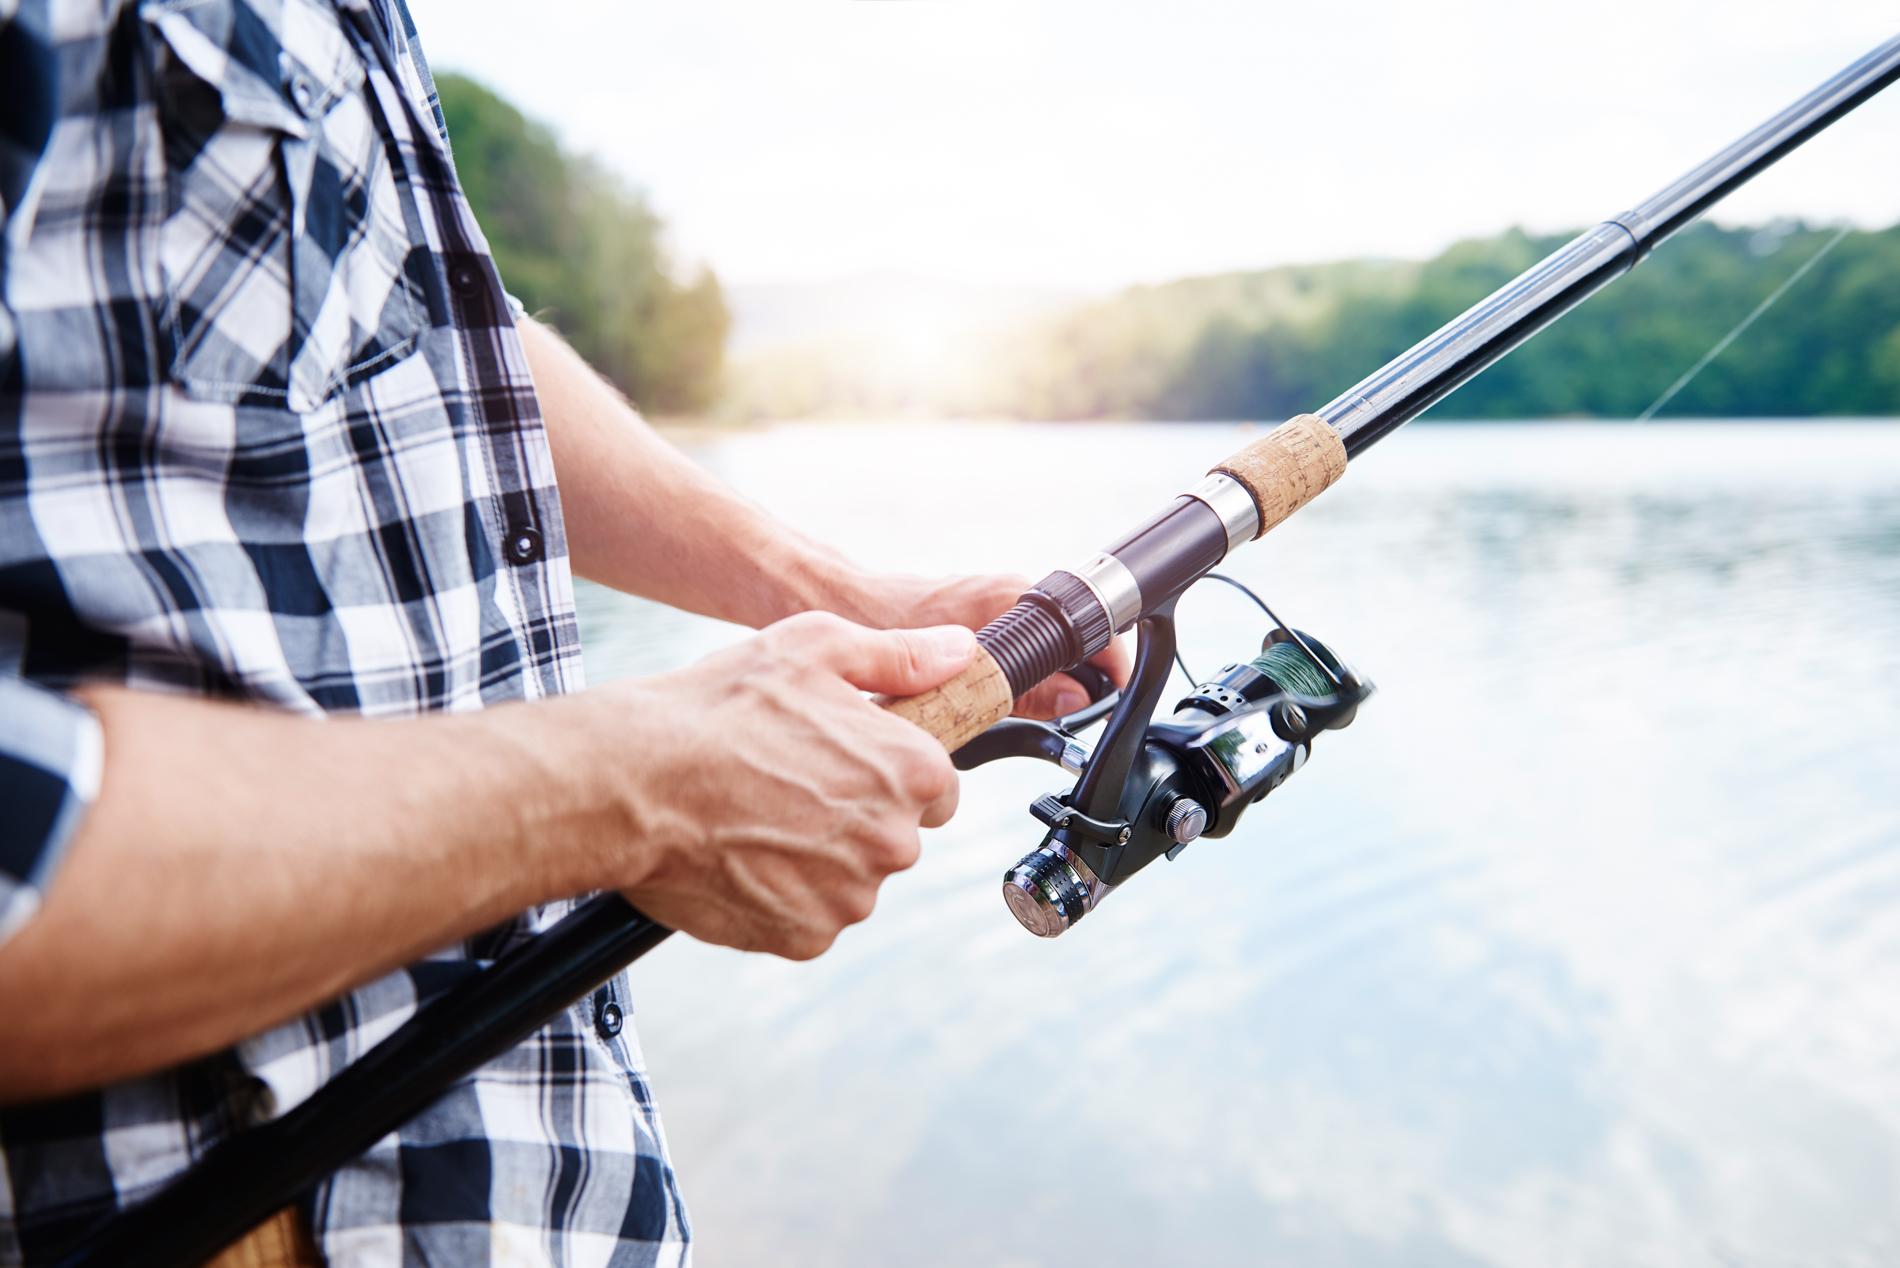 storyblocks-human-hand-holding-fishing-rod_Bwe0mXlFqz.jpg